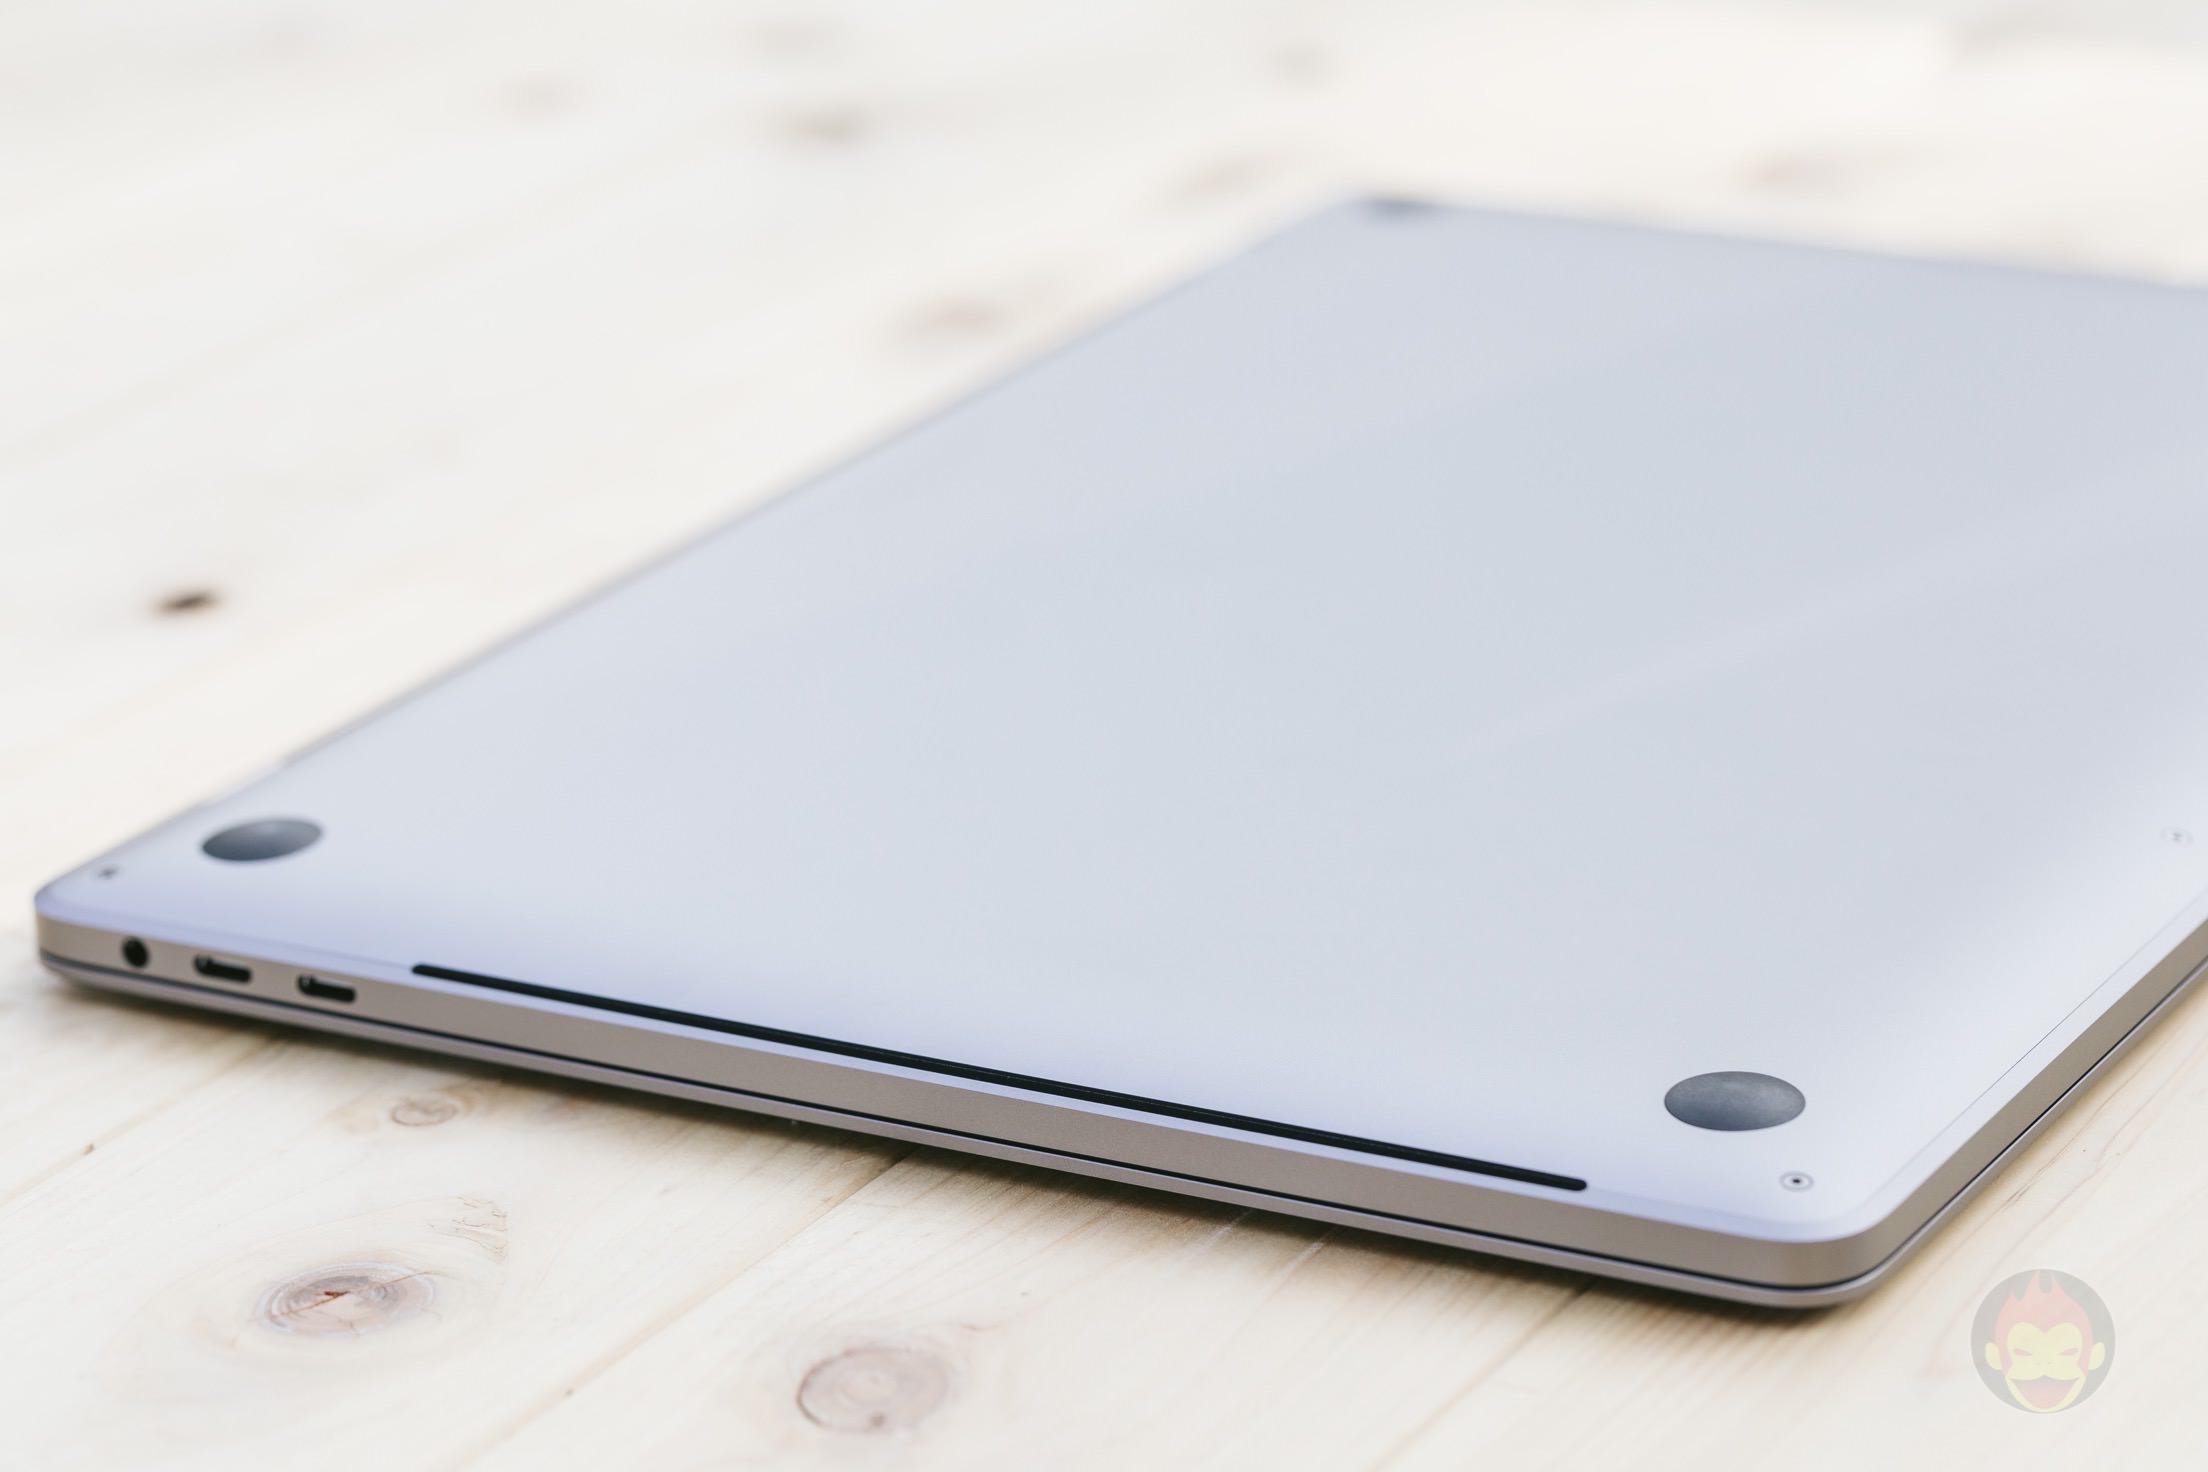 MacBook Pro Late2016 15inch model